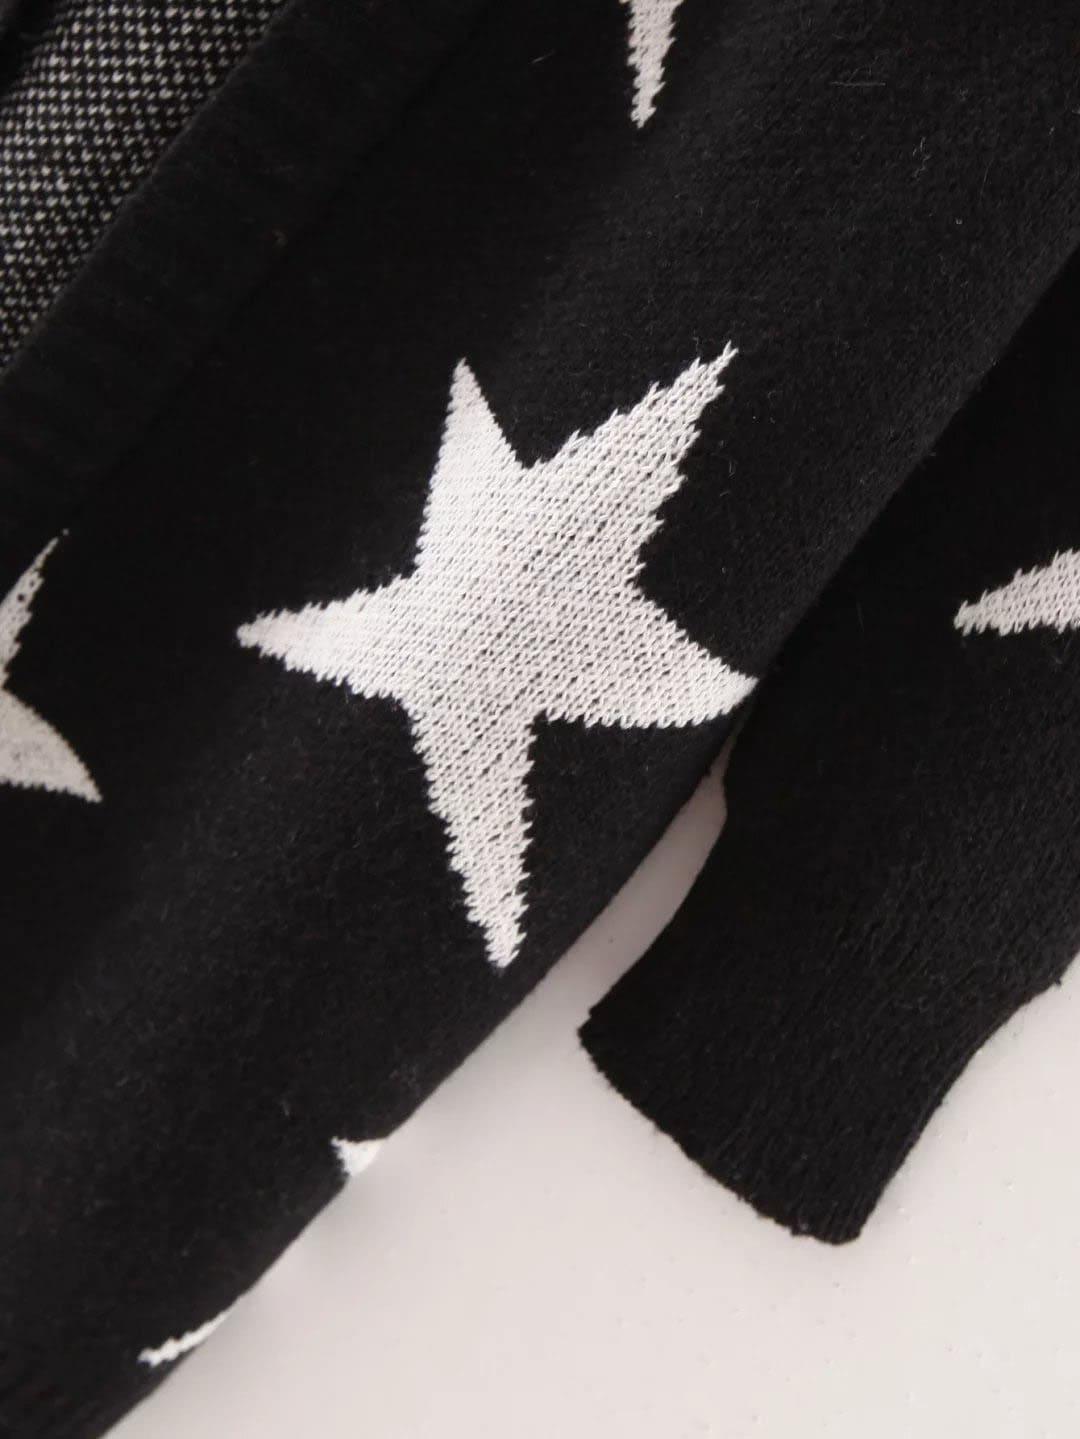 sweater160816234_2